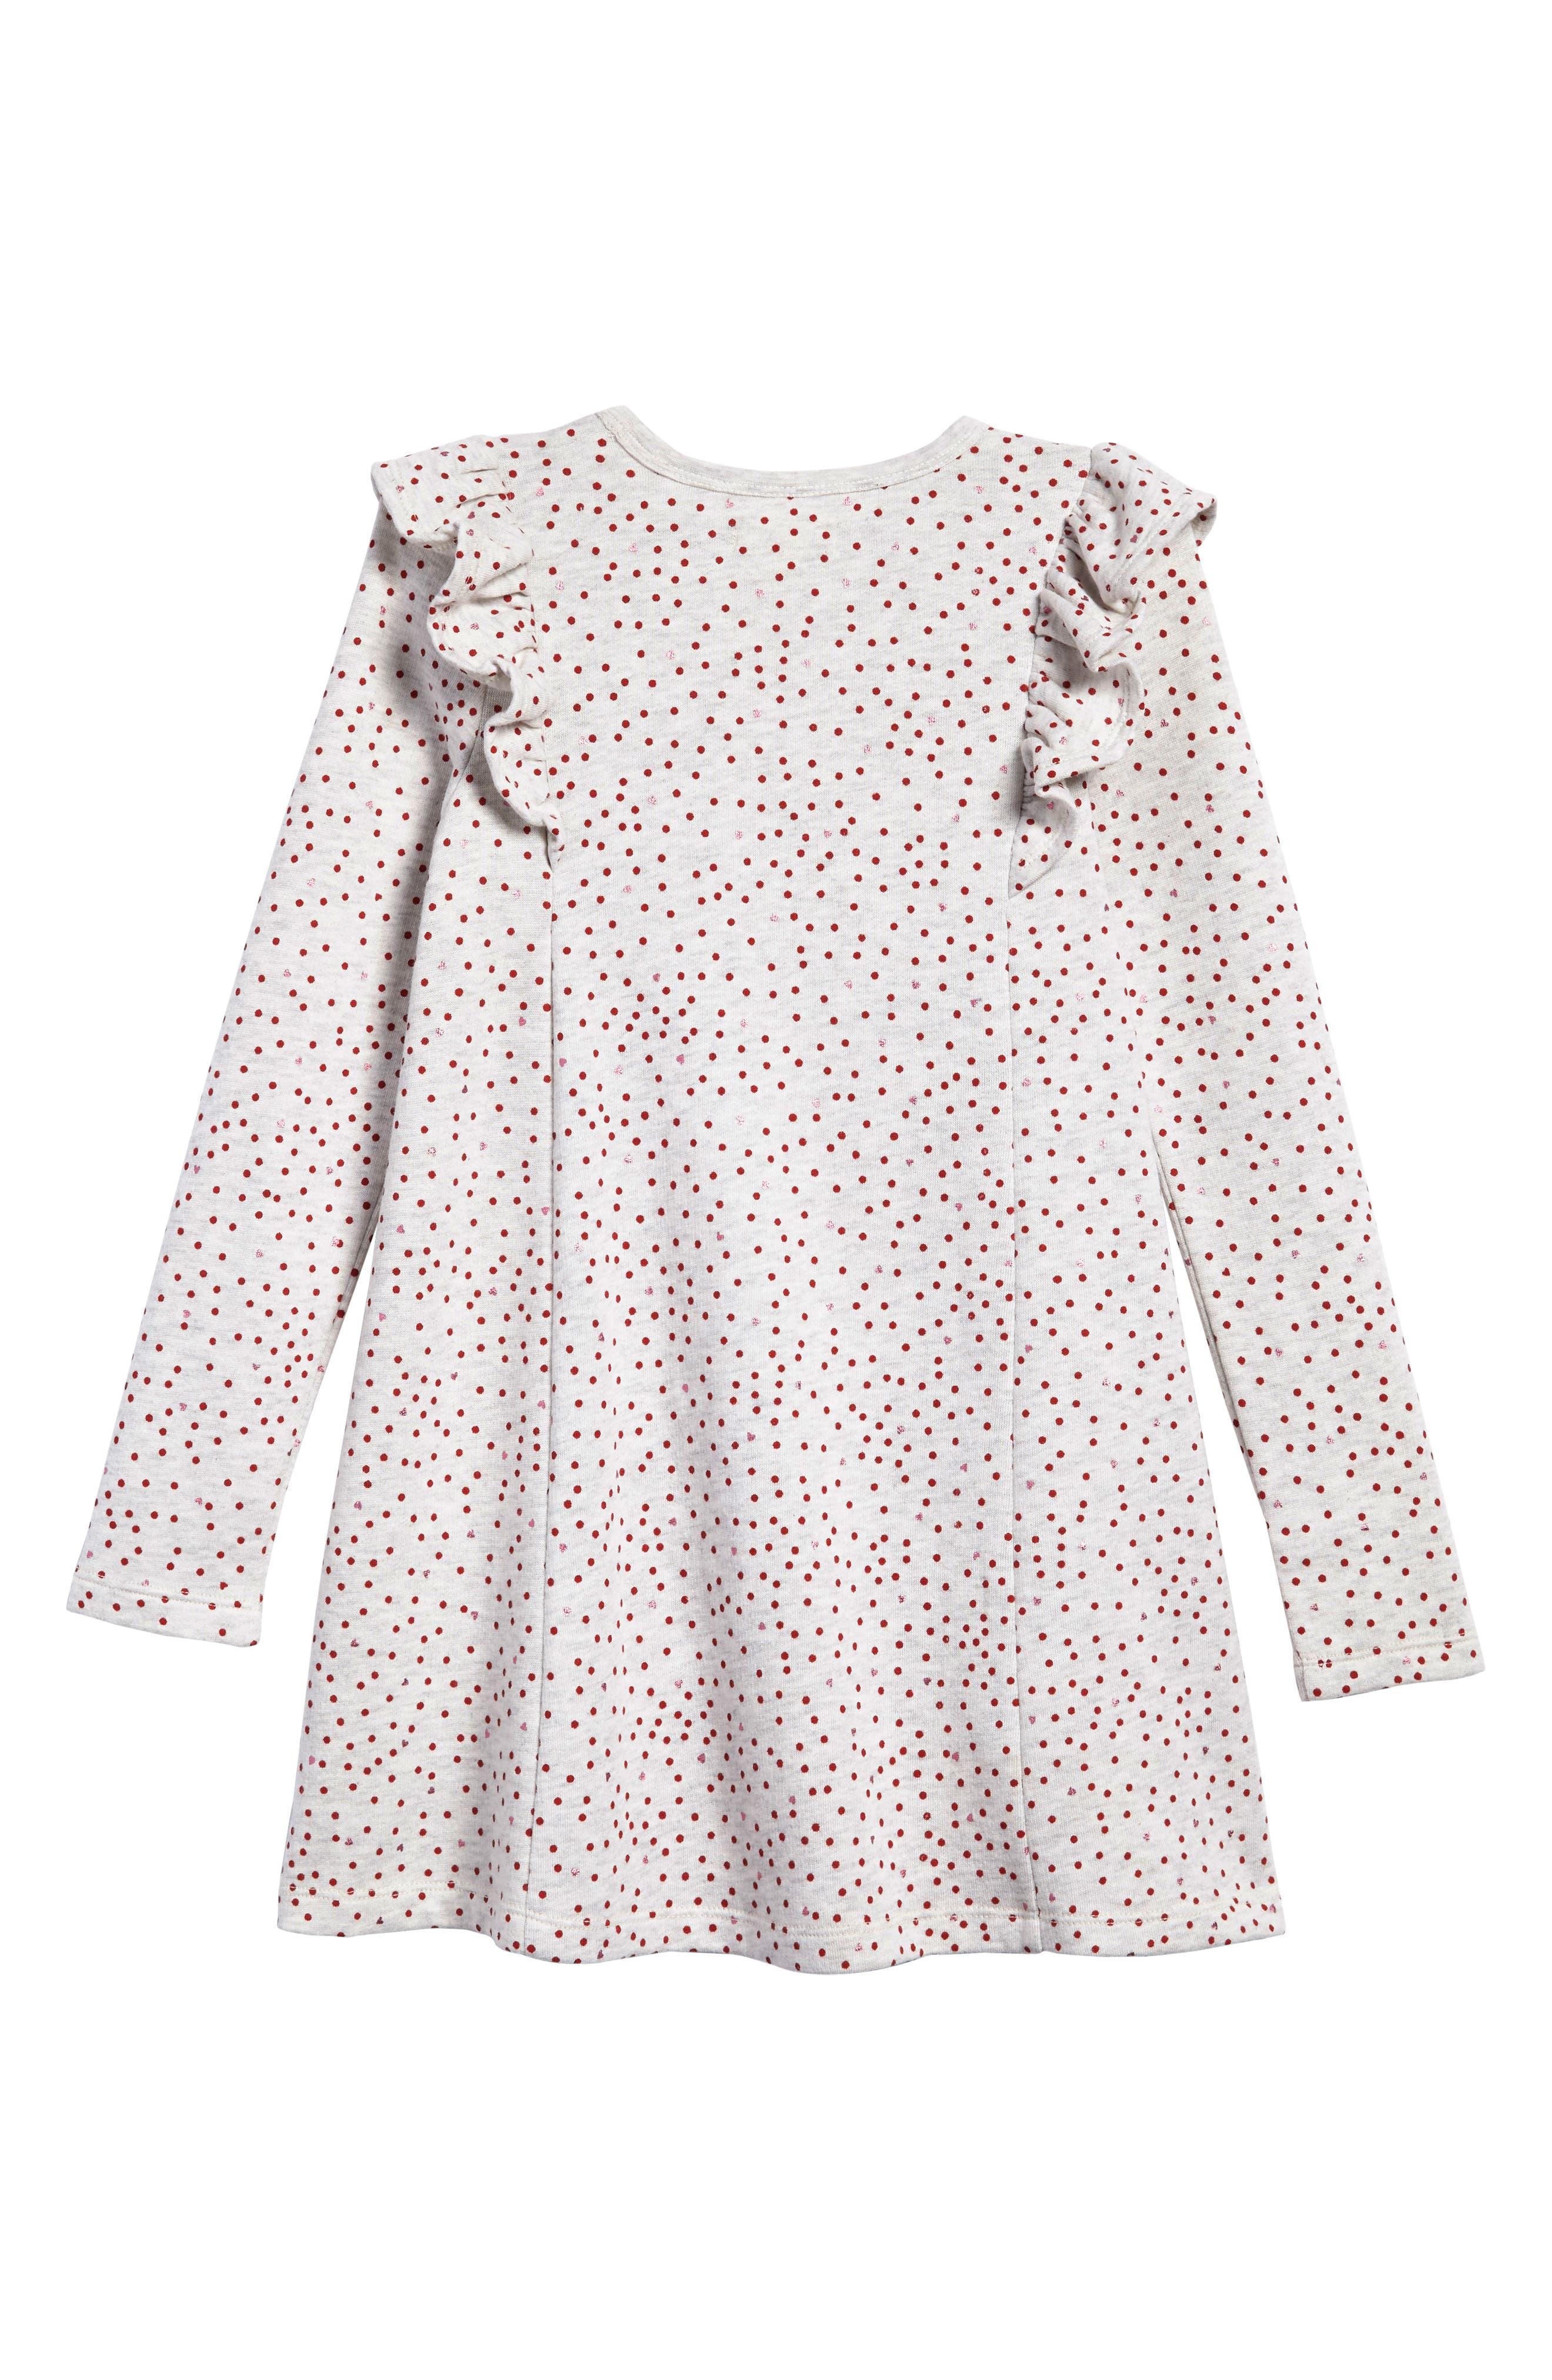 Alternate Image 1 Selected - Tucker + Tate Ruffle Fleece Sweater Dress (Toddler Girls, Little Girls & Big Girls)